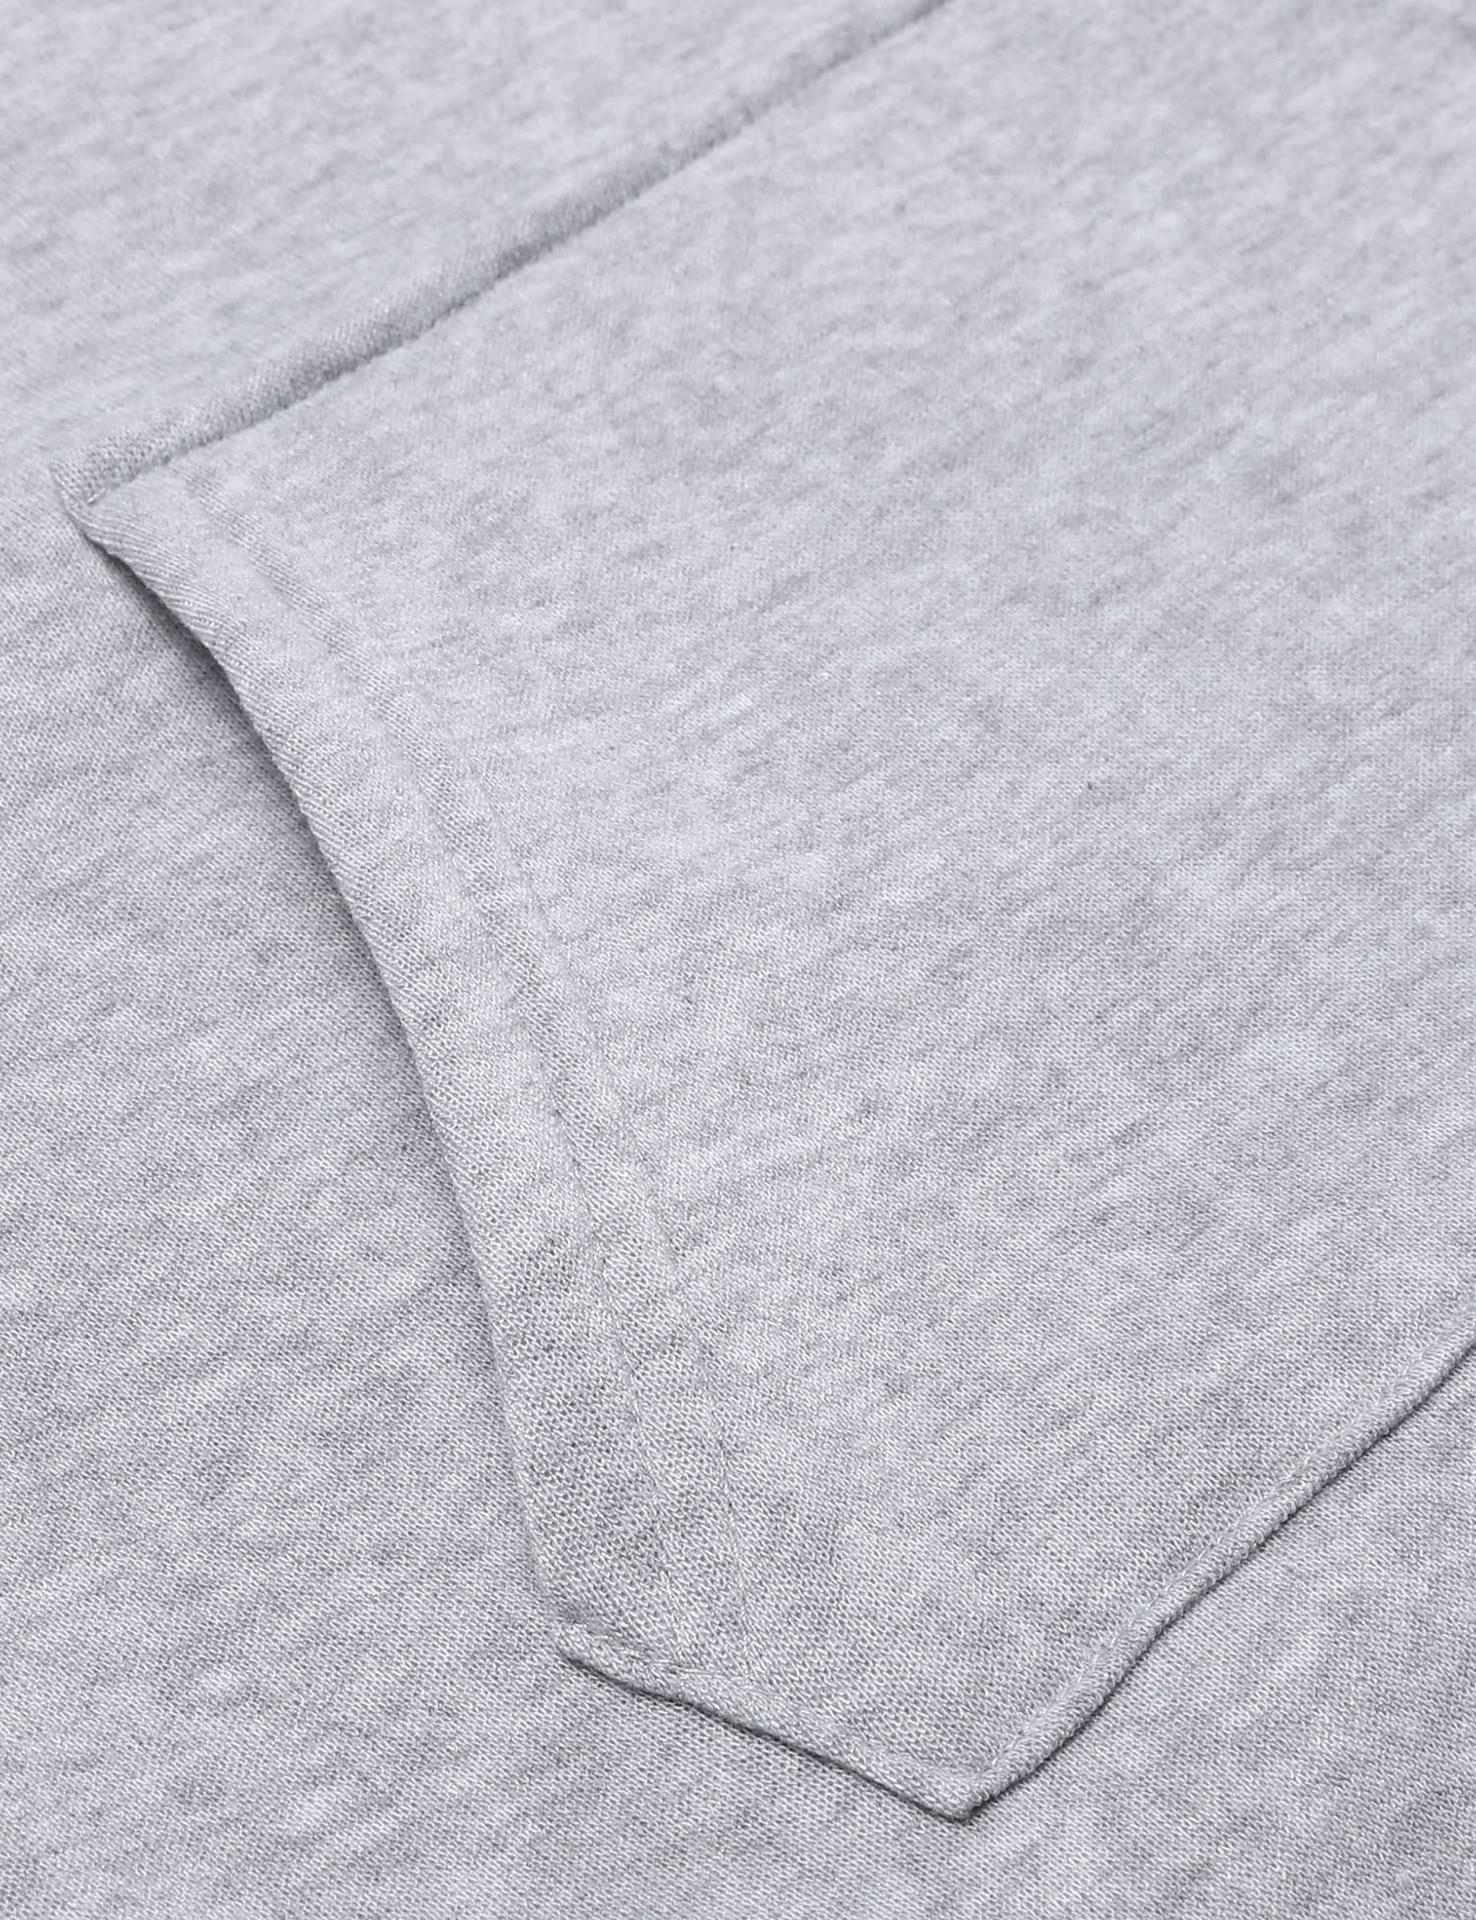 HTB1BGRPXlKw3KVjSZFOq6yrDVXar High Quality 2019 New Hot Sale Fashion Women's Casual Style Hooded Hoodie Long Sleeve Sweater Pocket Bodycon Tunic Dress Top